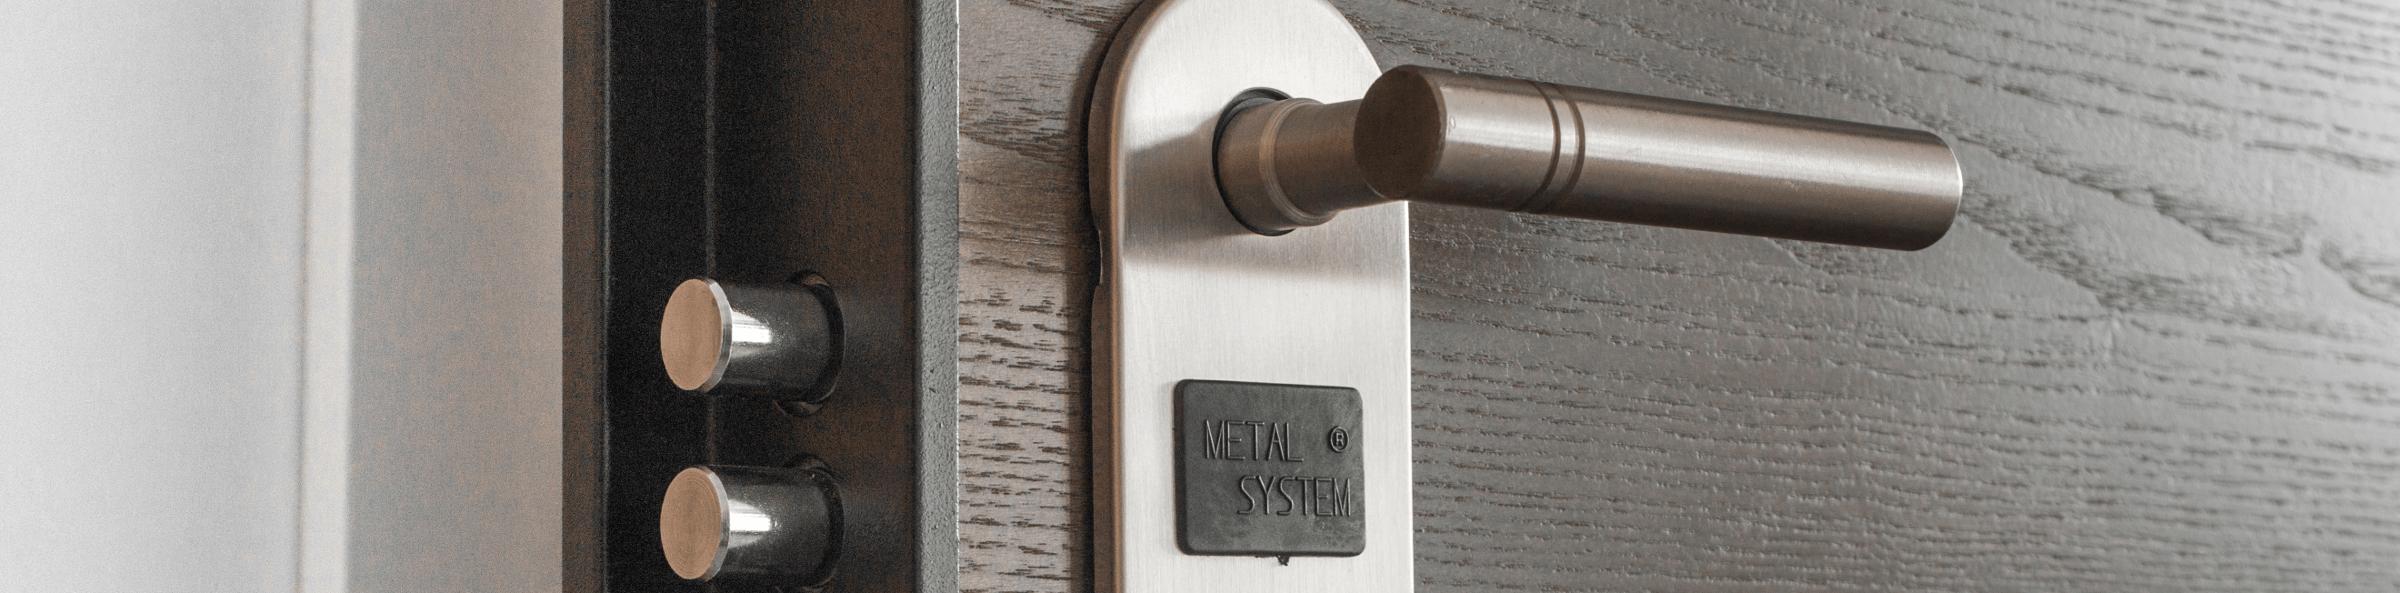 puerta cerrajeria - Cerrajero Villaverde Urgente Cerrajeria Villaverde 24 Horas